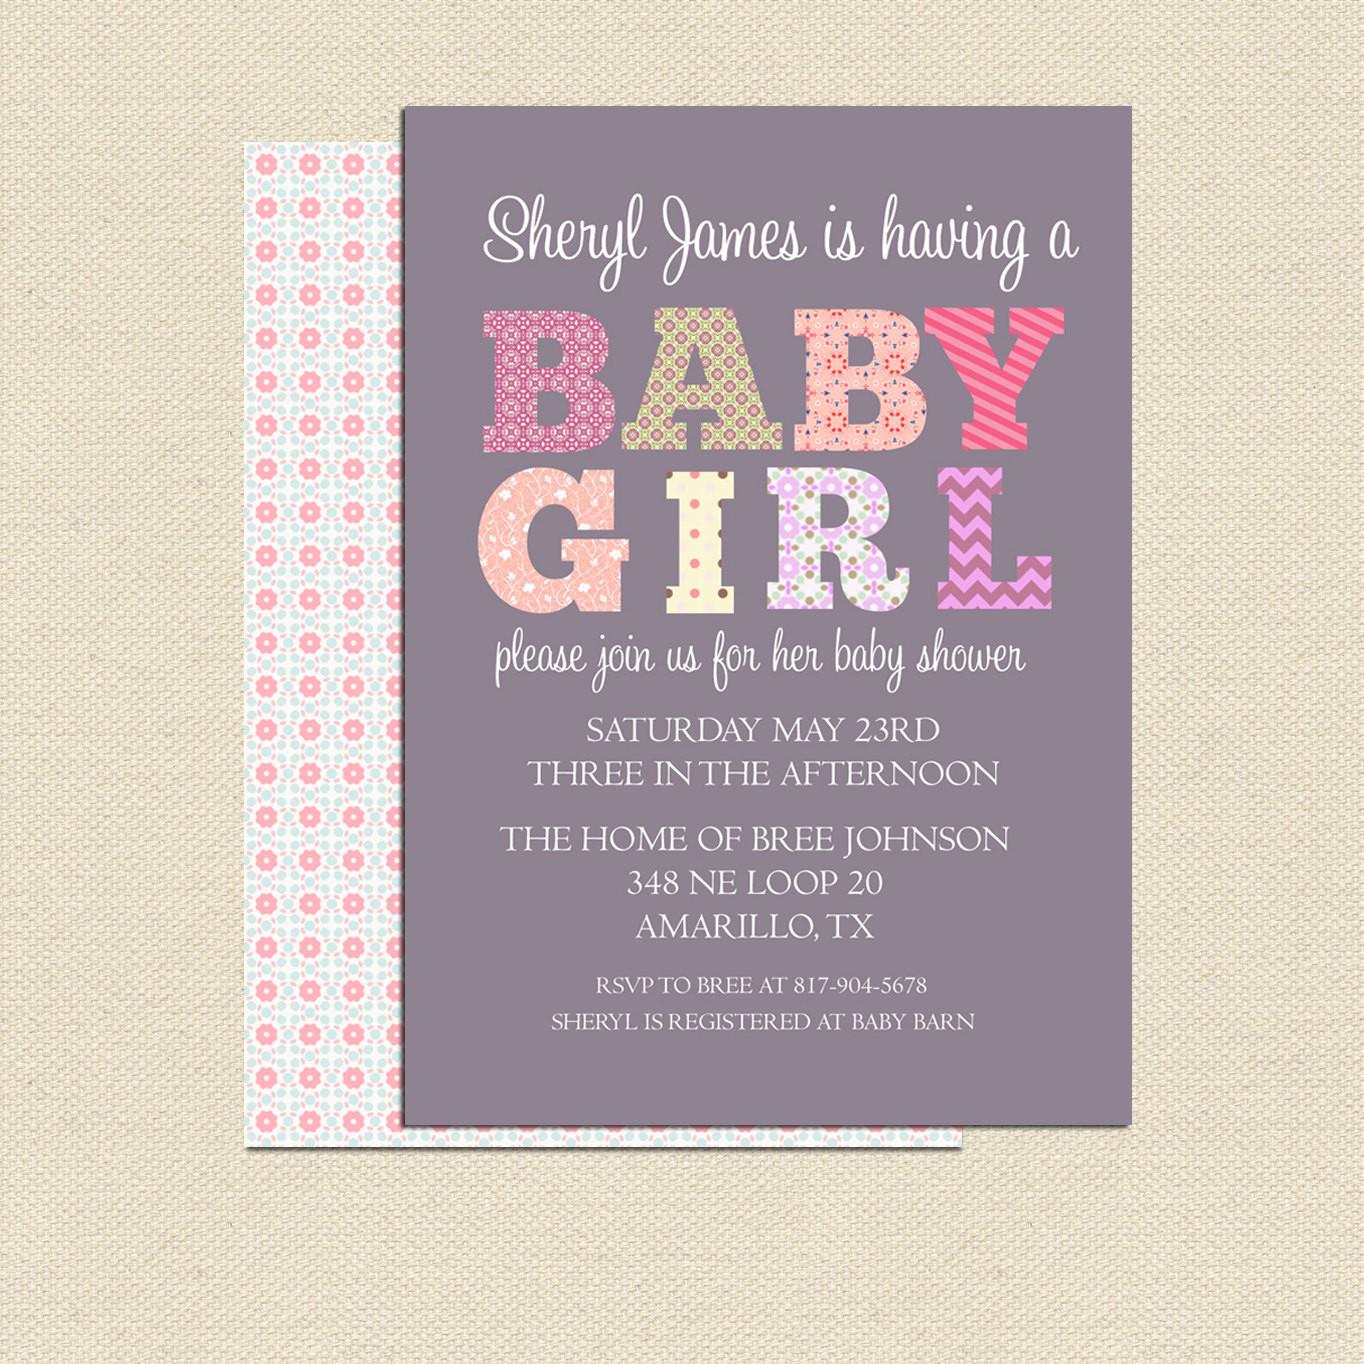 DIY Baby Shower Invitations Free  DIY Printable Baby Shower Invitation For Girl No 2